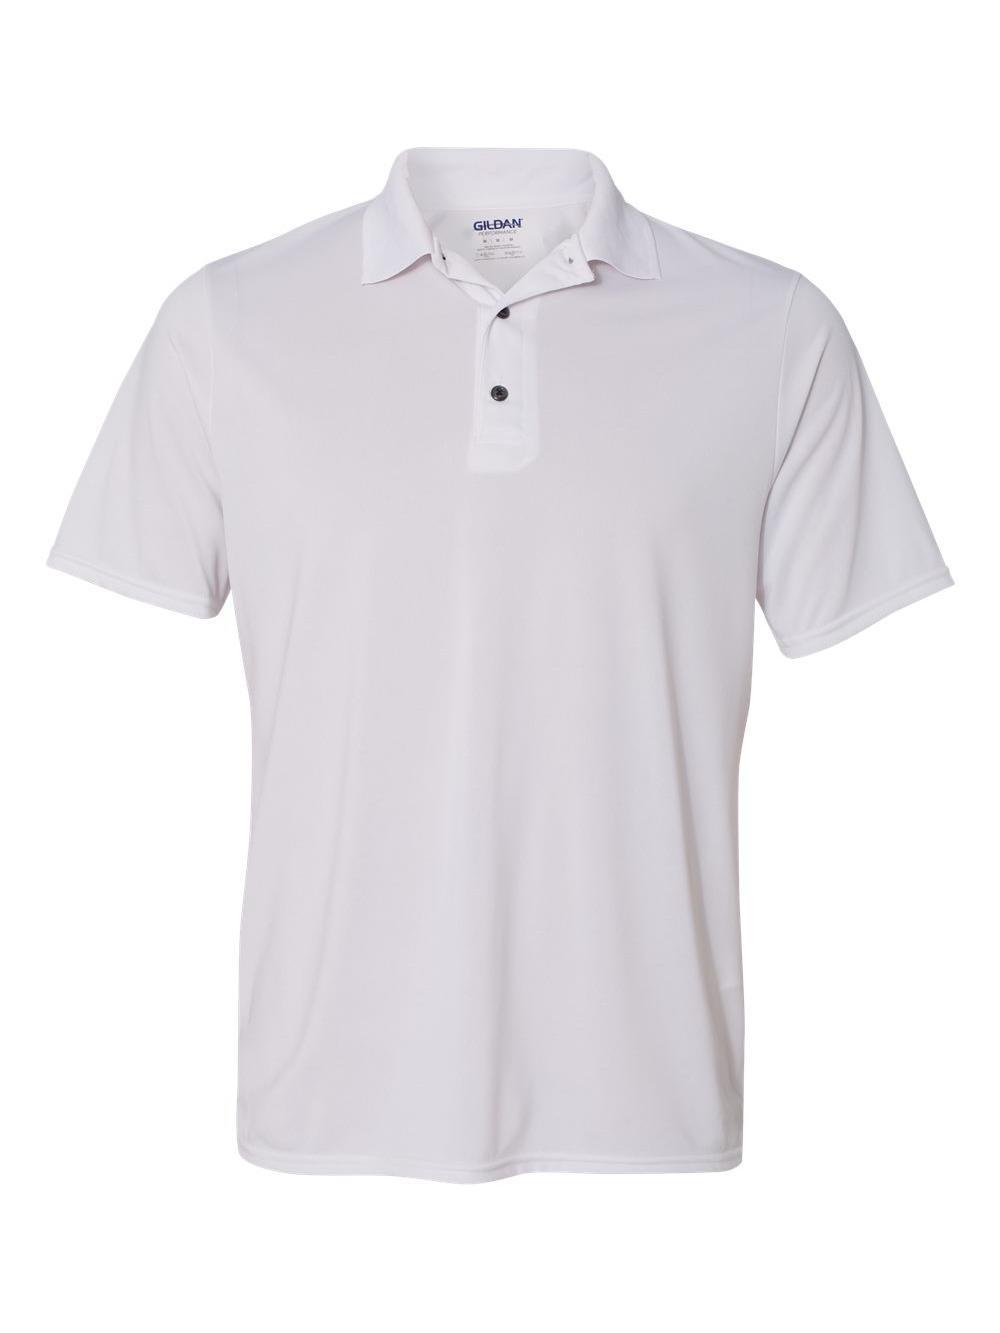 Gildan-Performance-Jersey-Sport-Shirt-44800 thumbnail 24